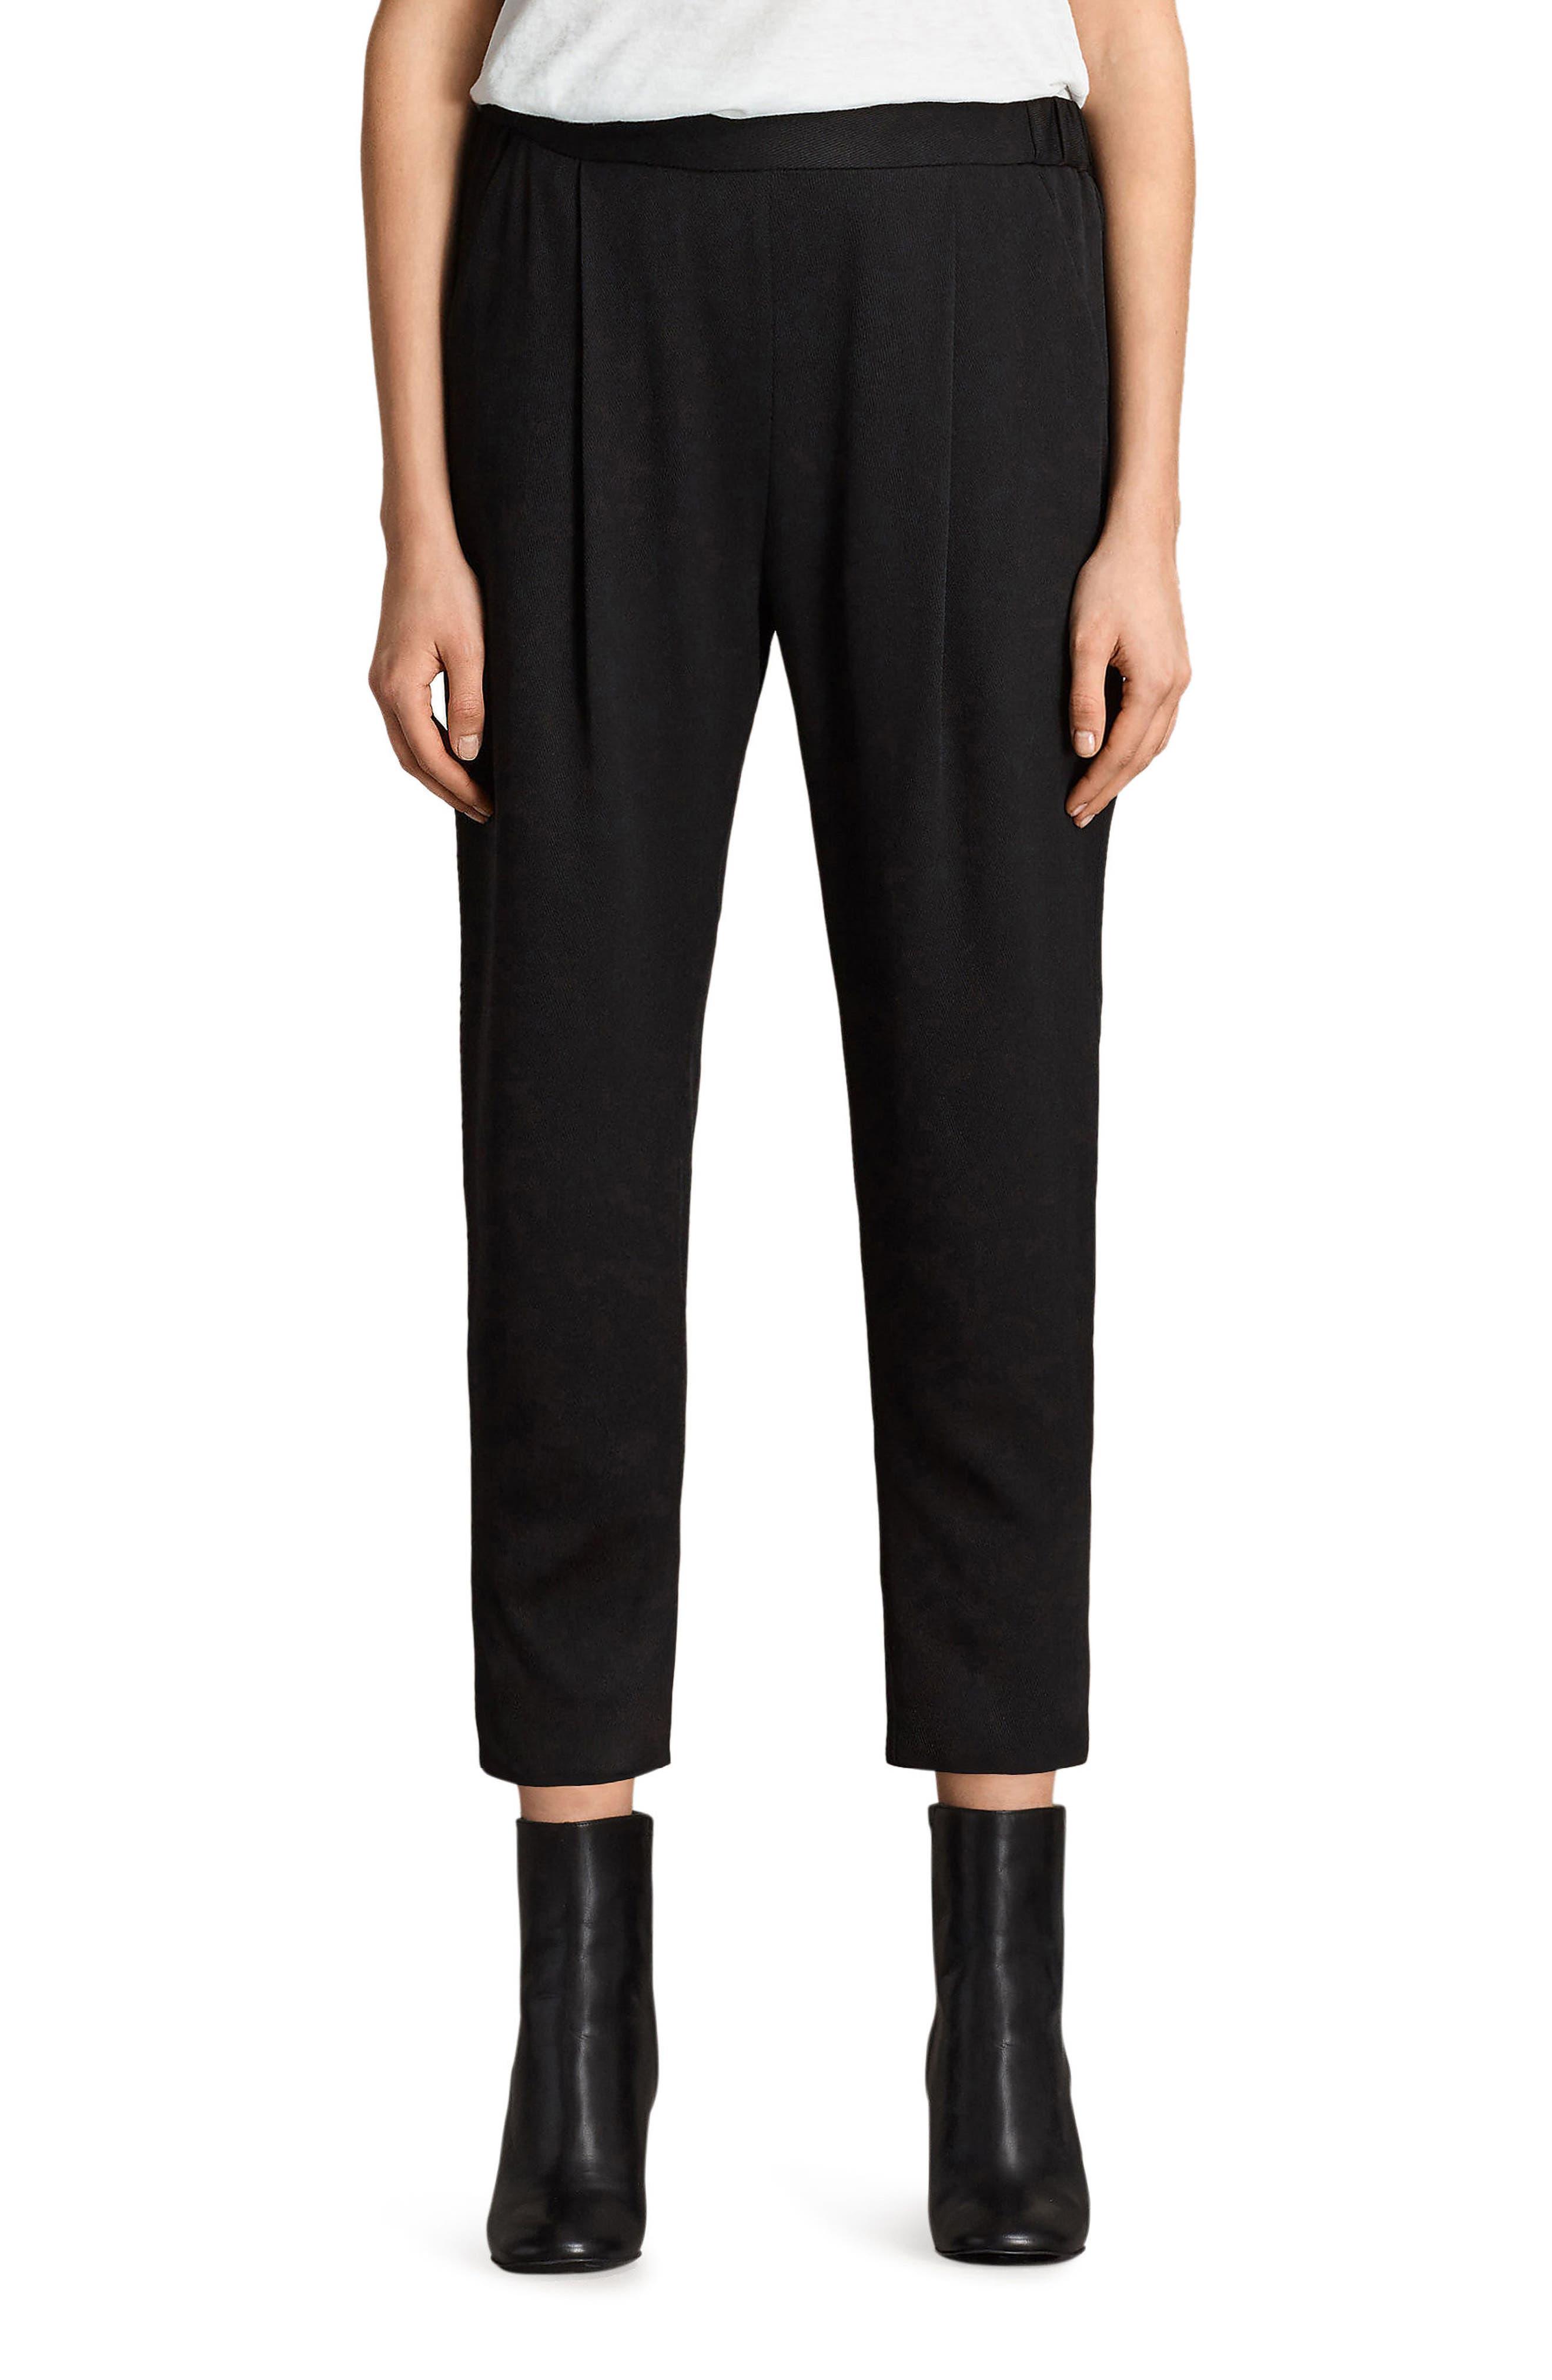 Aleida Pants,                         Main,                         color, BLACK